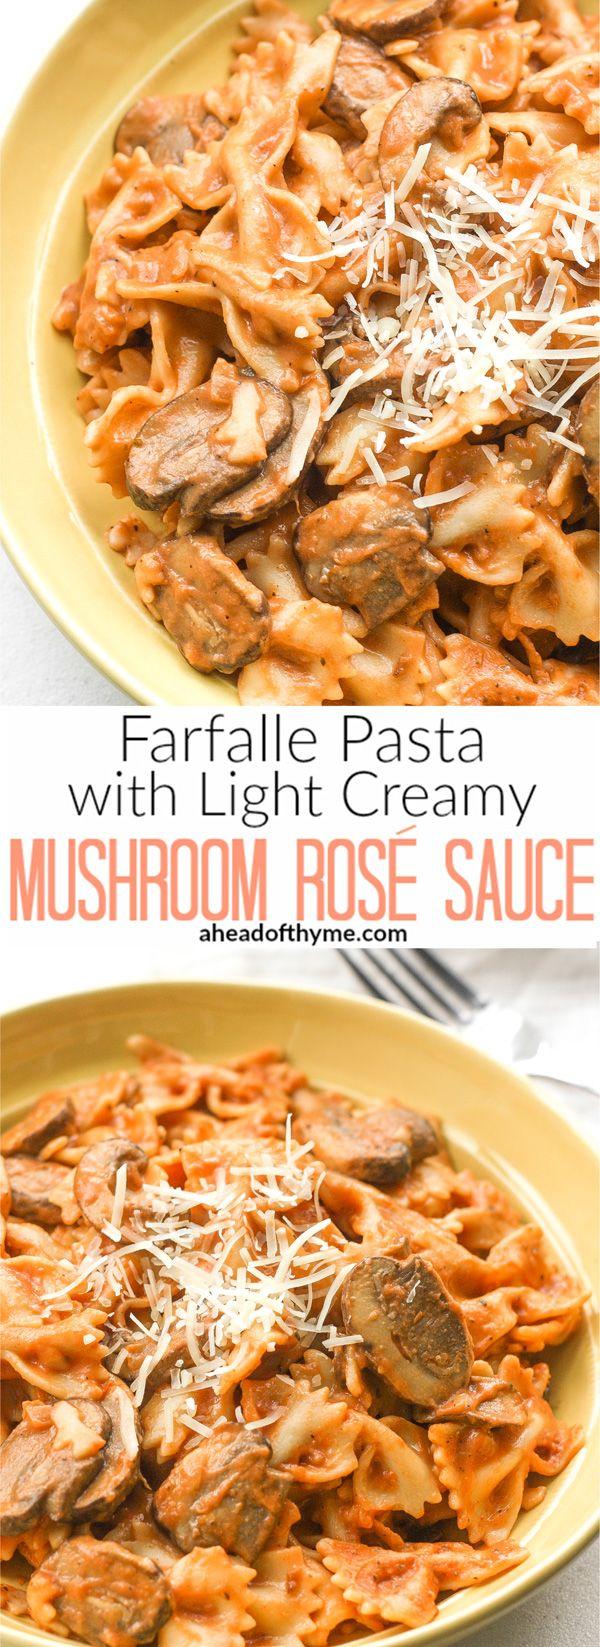 Farfalle Pasta with Light Creamy Mushroom Rosé Sauce: This heavenly combination of farfalle pasta, mushrooms and creamy rosé sauce makes up the best and creamiest Italian comfort food | aheadofthyme.com